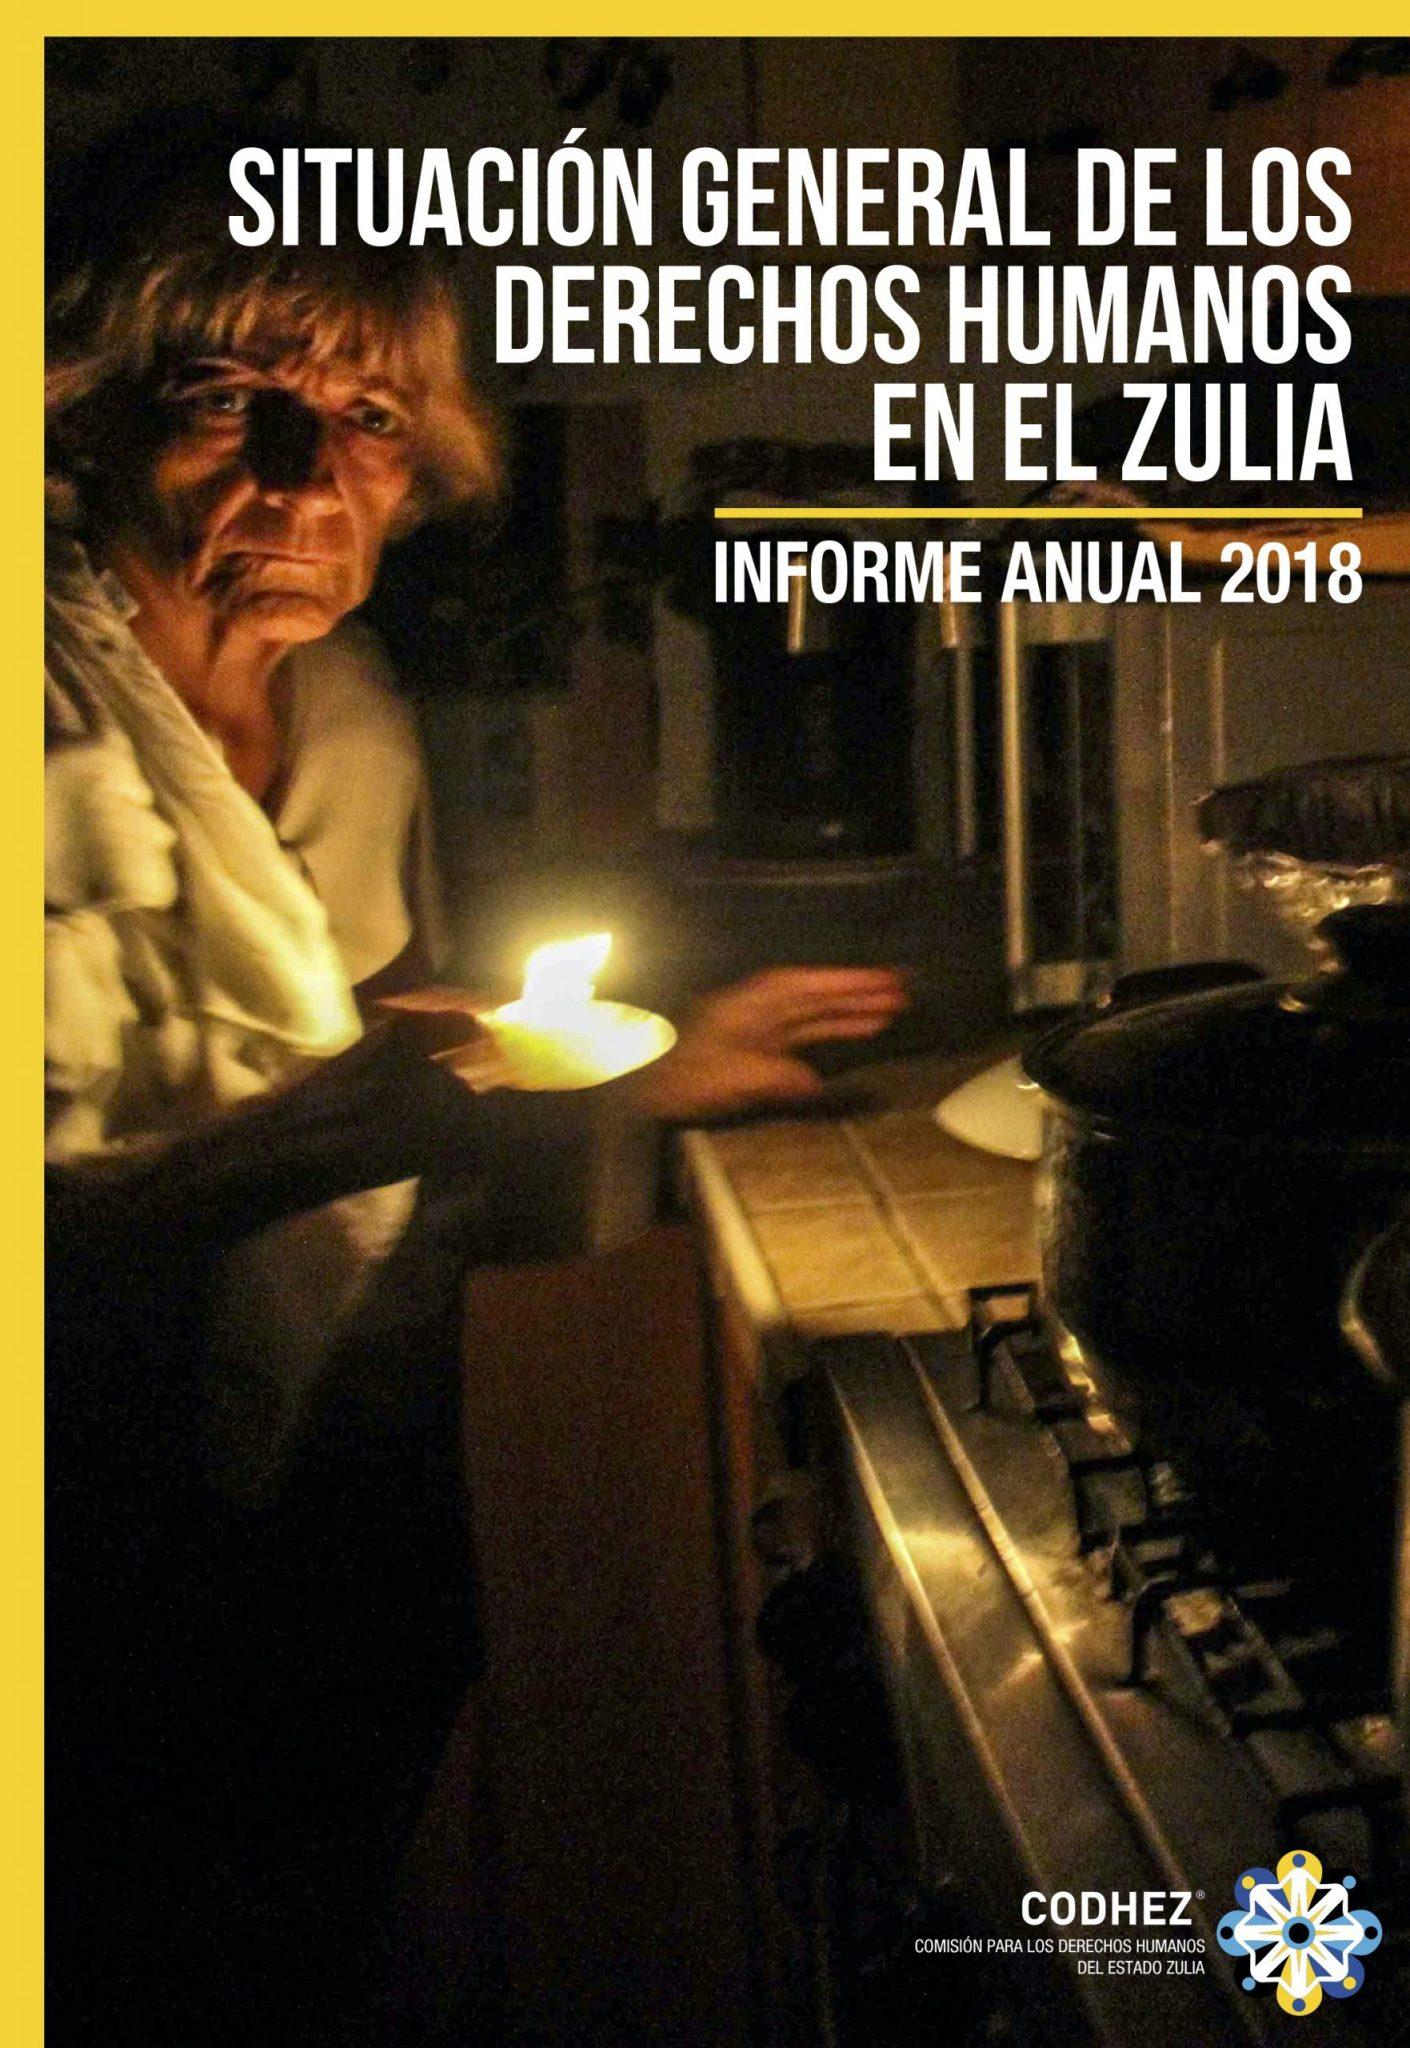 Codhez: Informe anual 2018